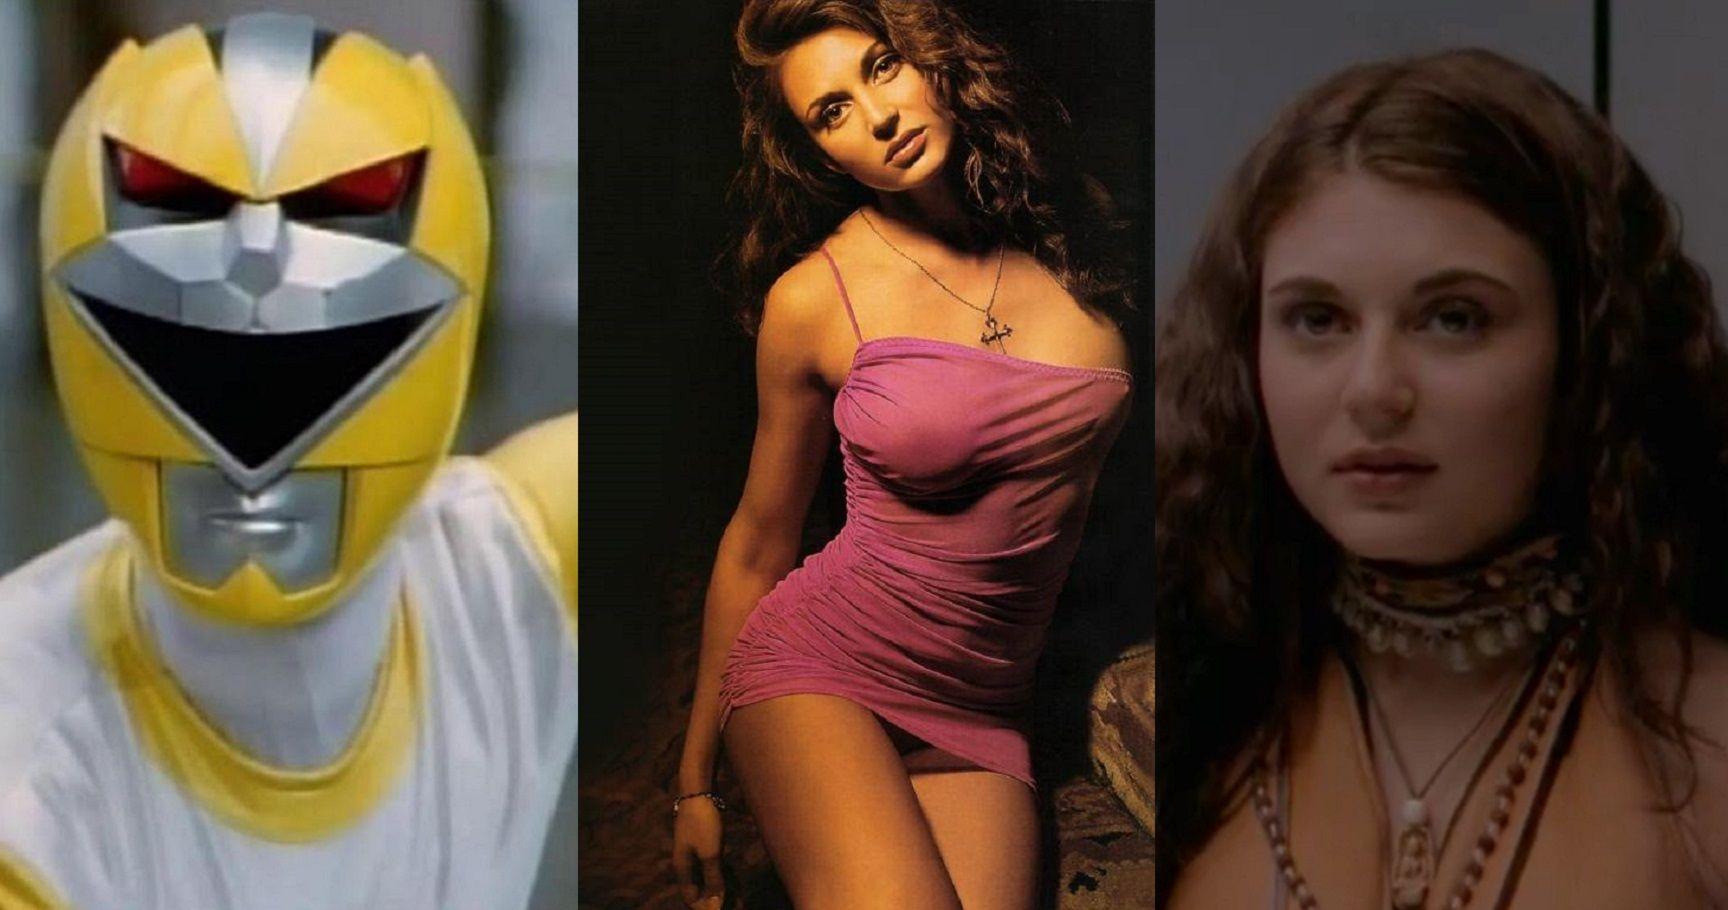 The 20 Hottest Power Ranger Babes